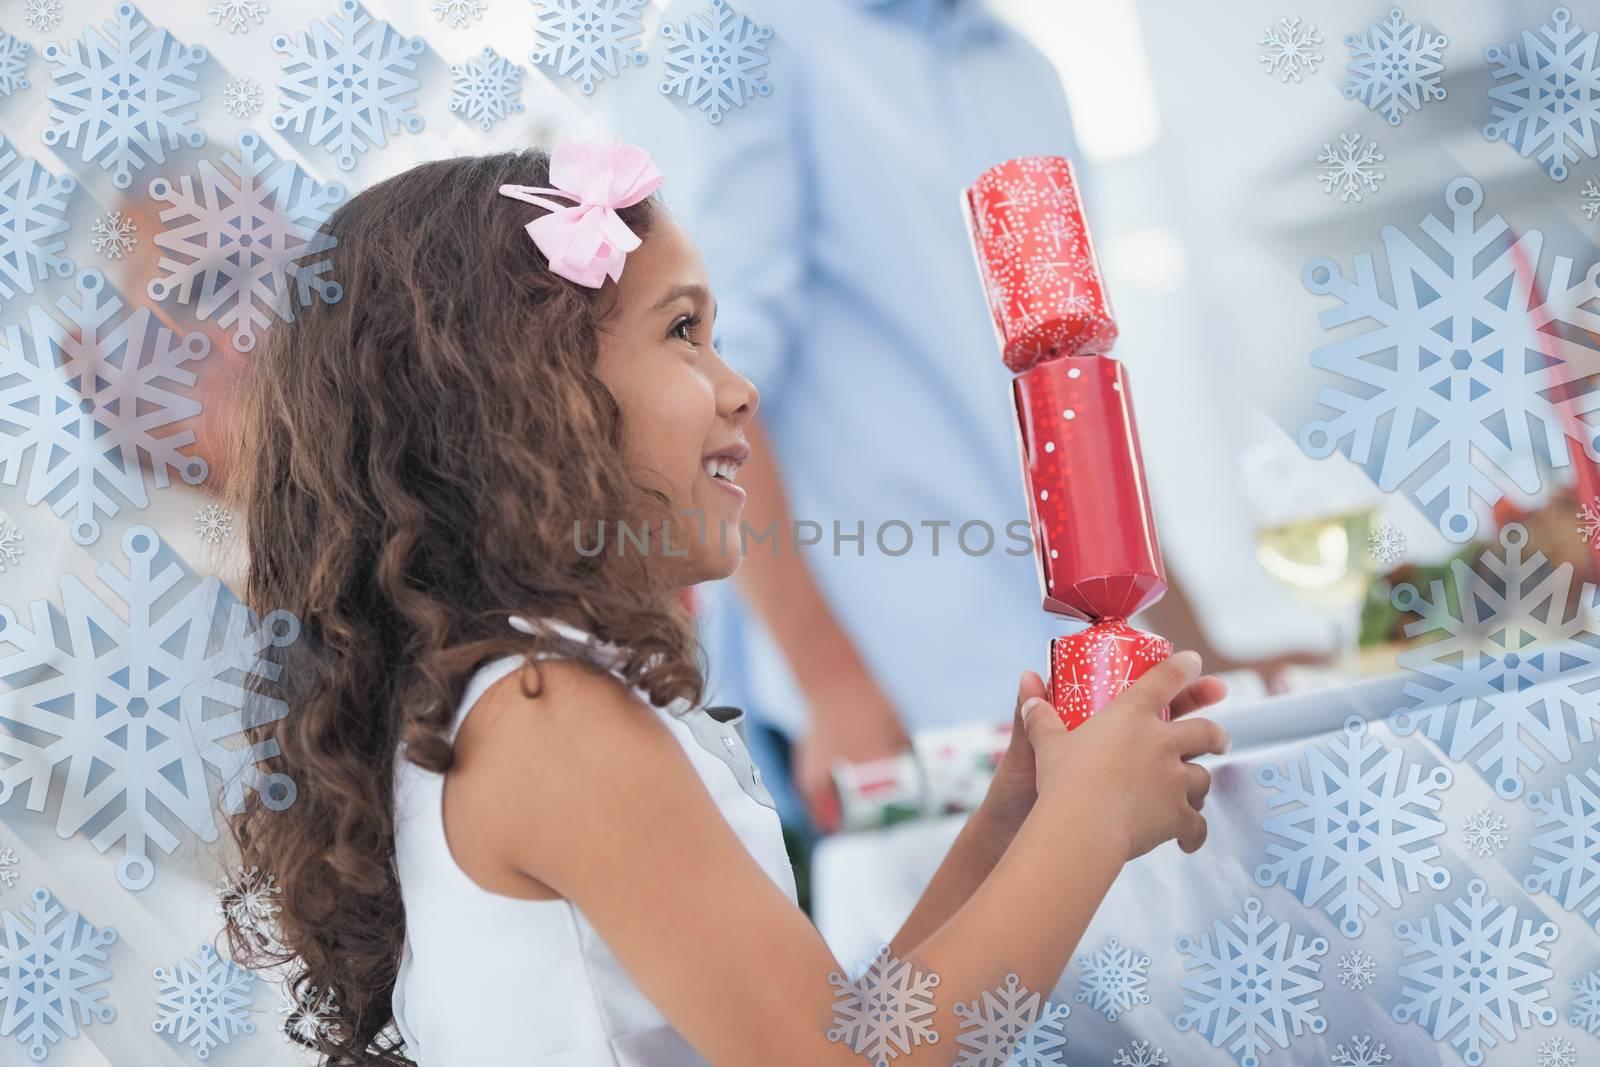 Cute little girl holding crackers against snowflake frame